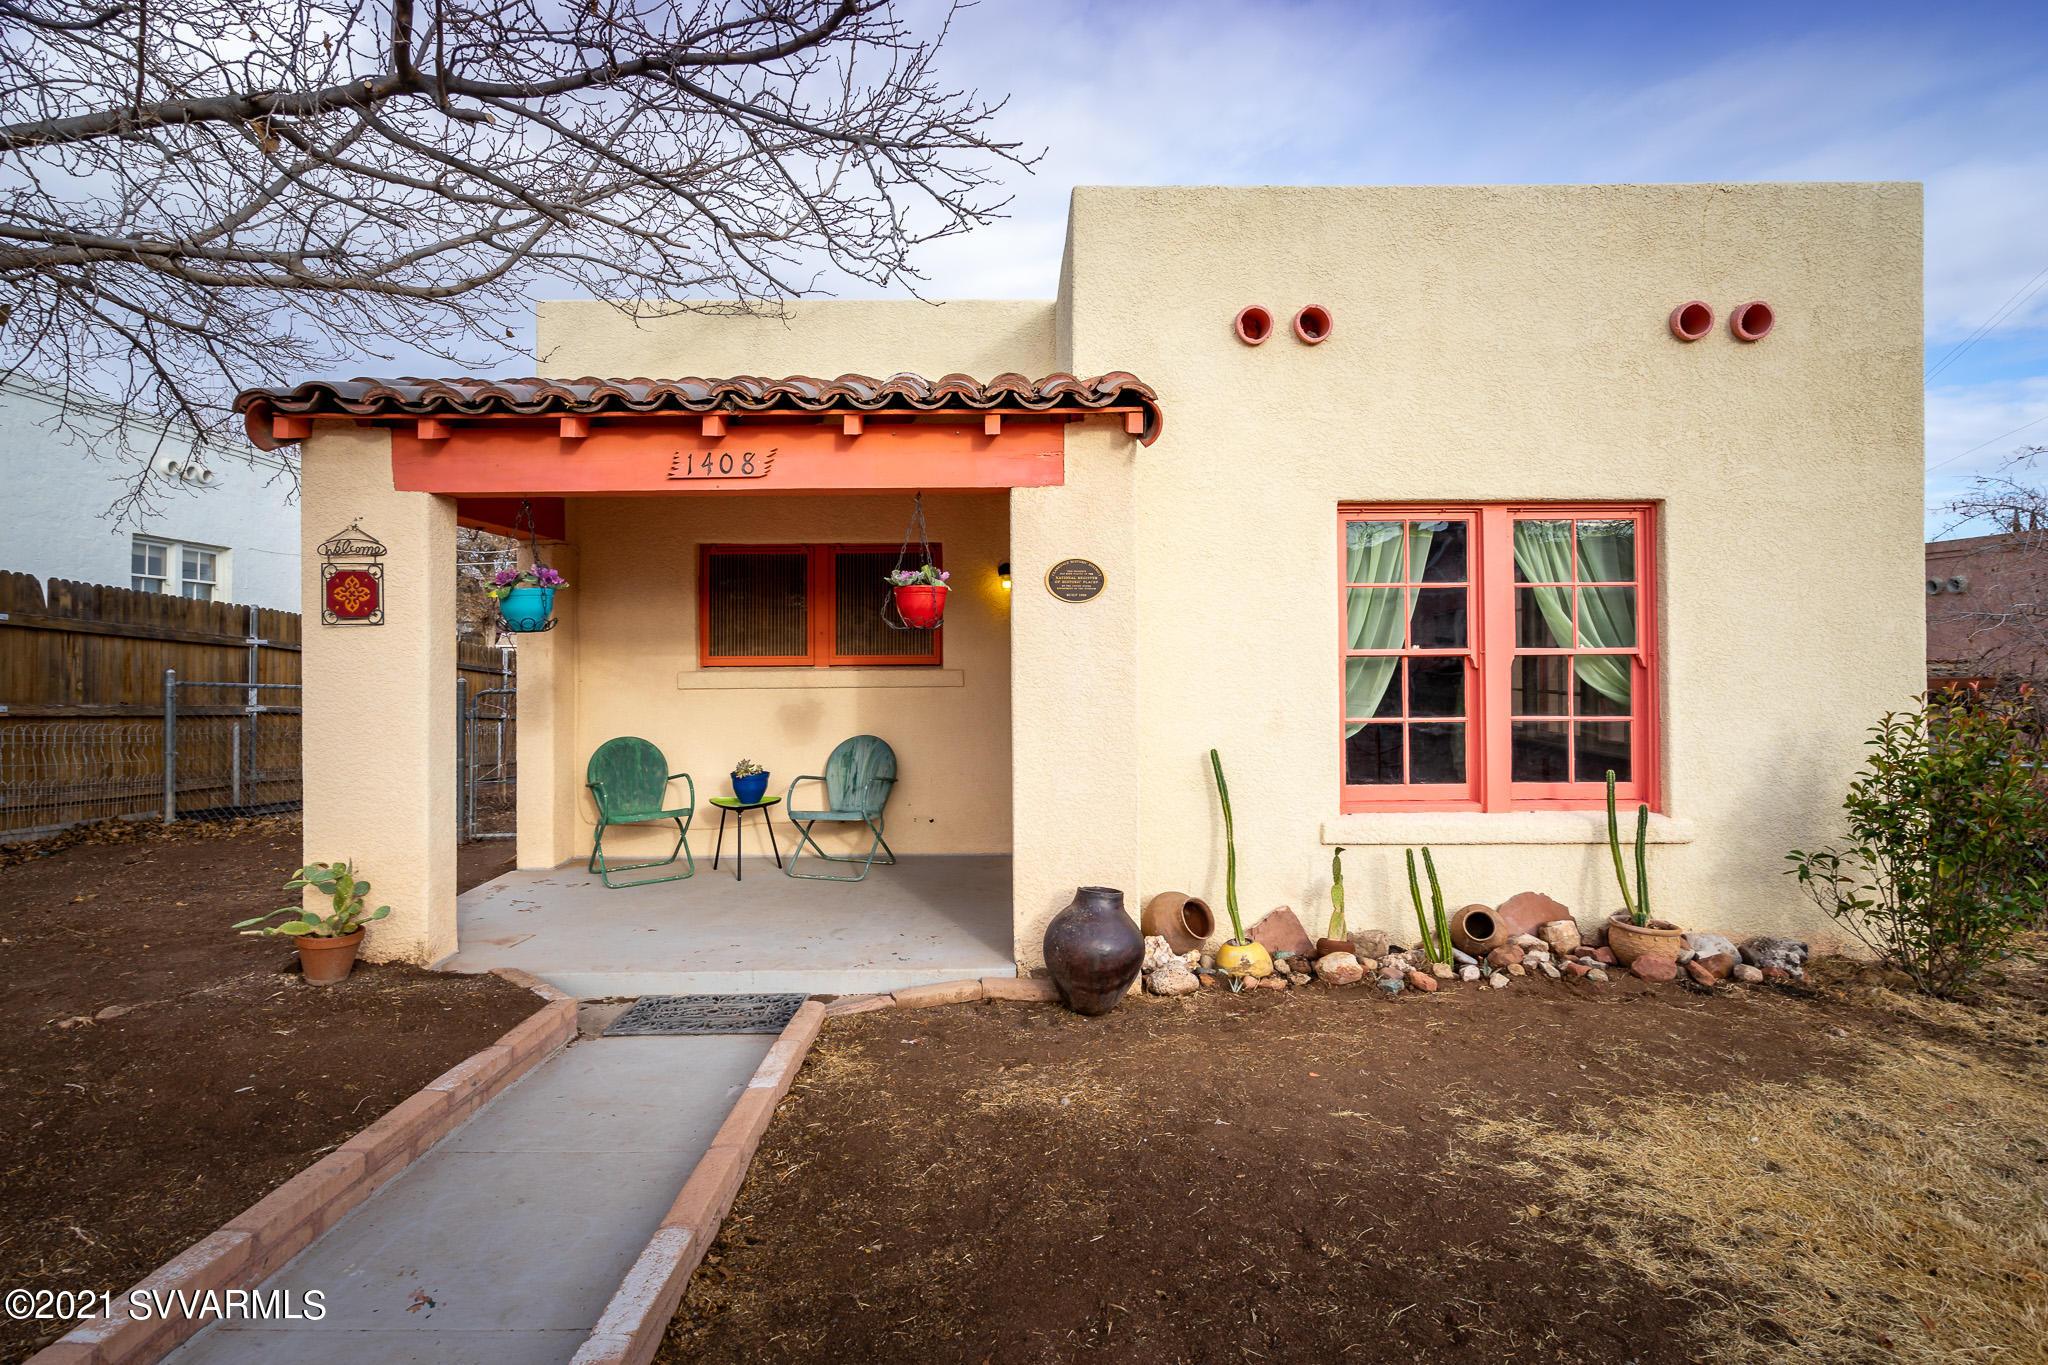 1408 Second South St Clarkdale, AZ 86324